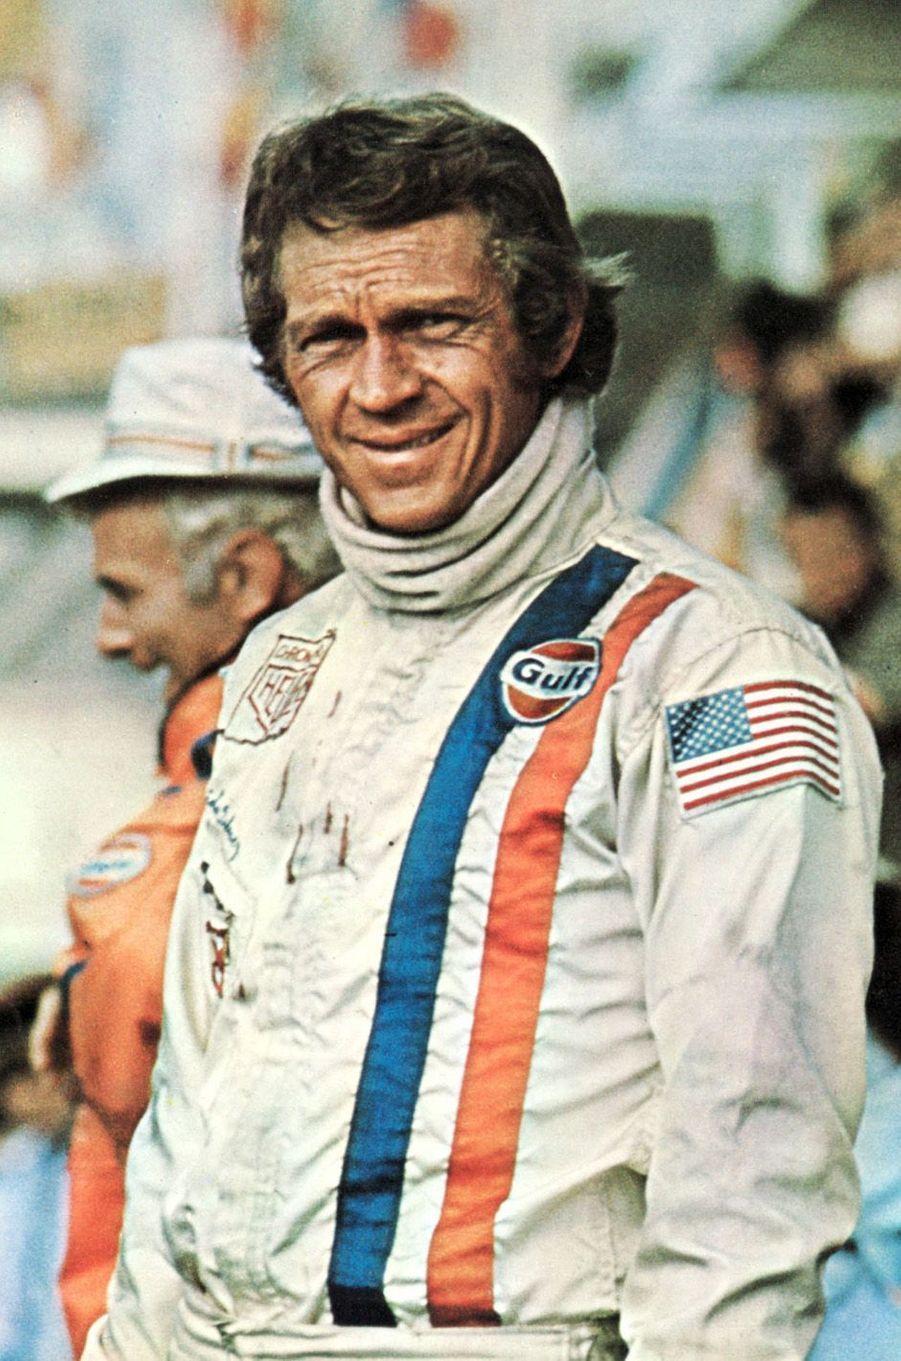 Steve McQueen au Mans en 1971.